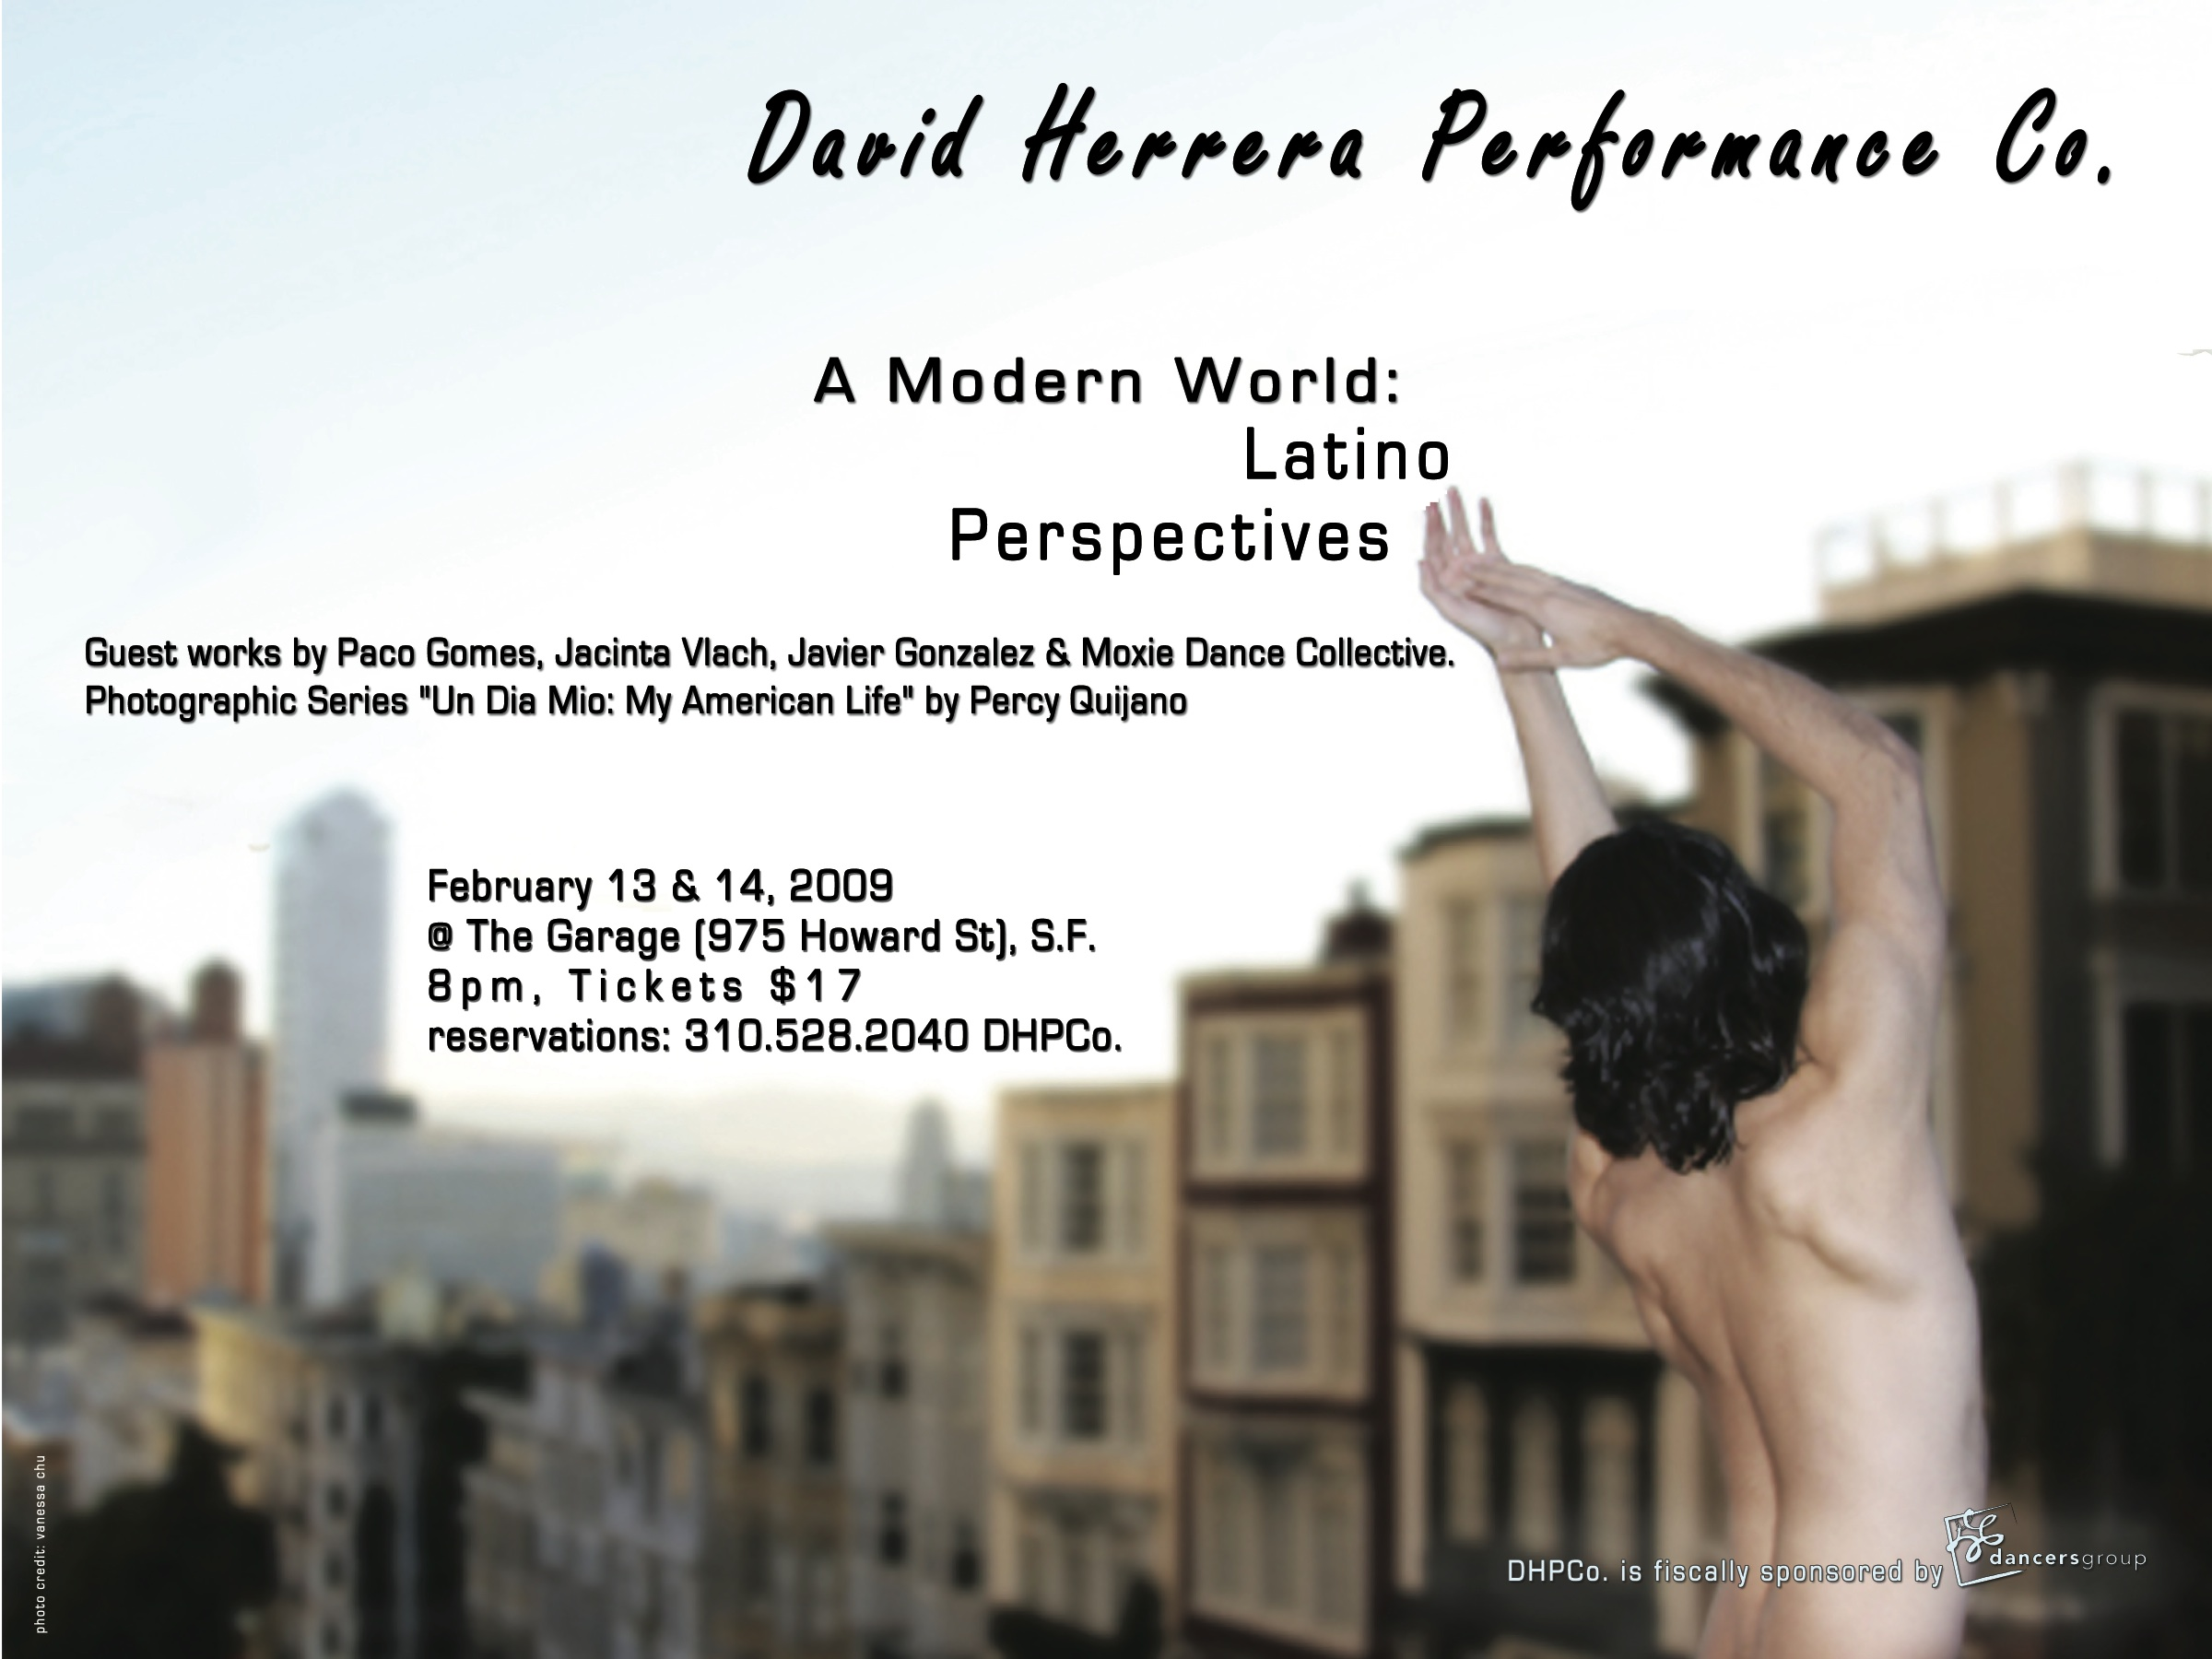 A Modern World: Latino Perspectives